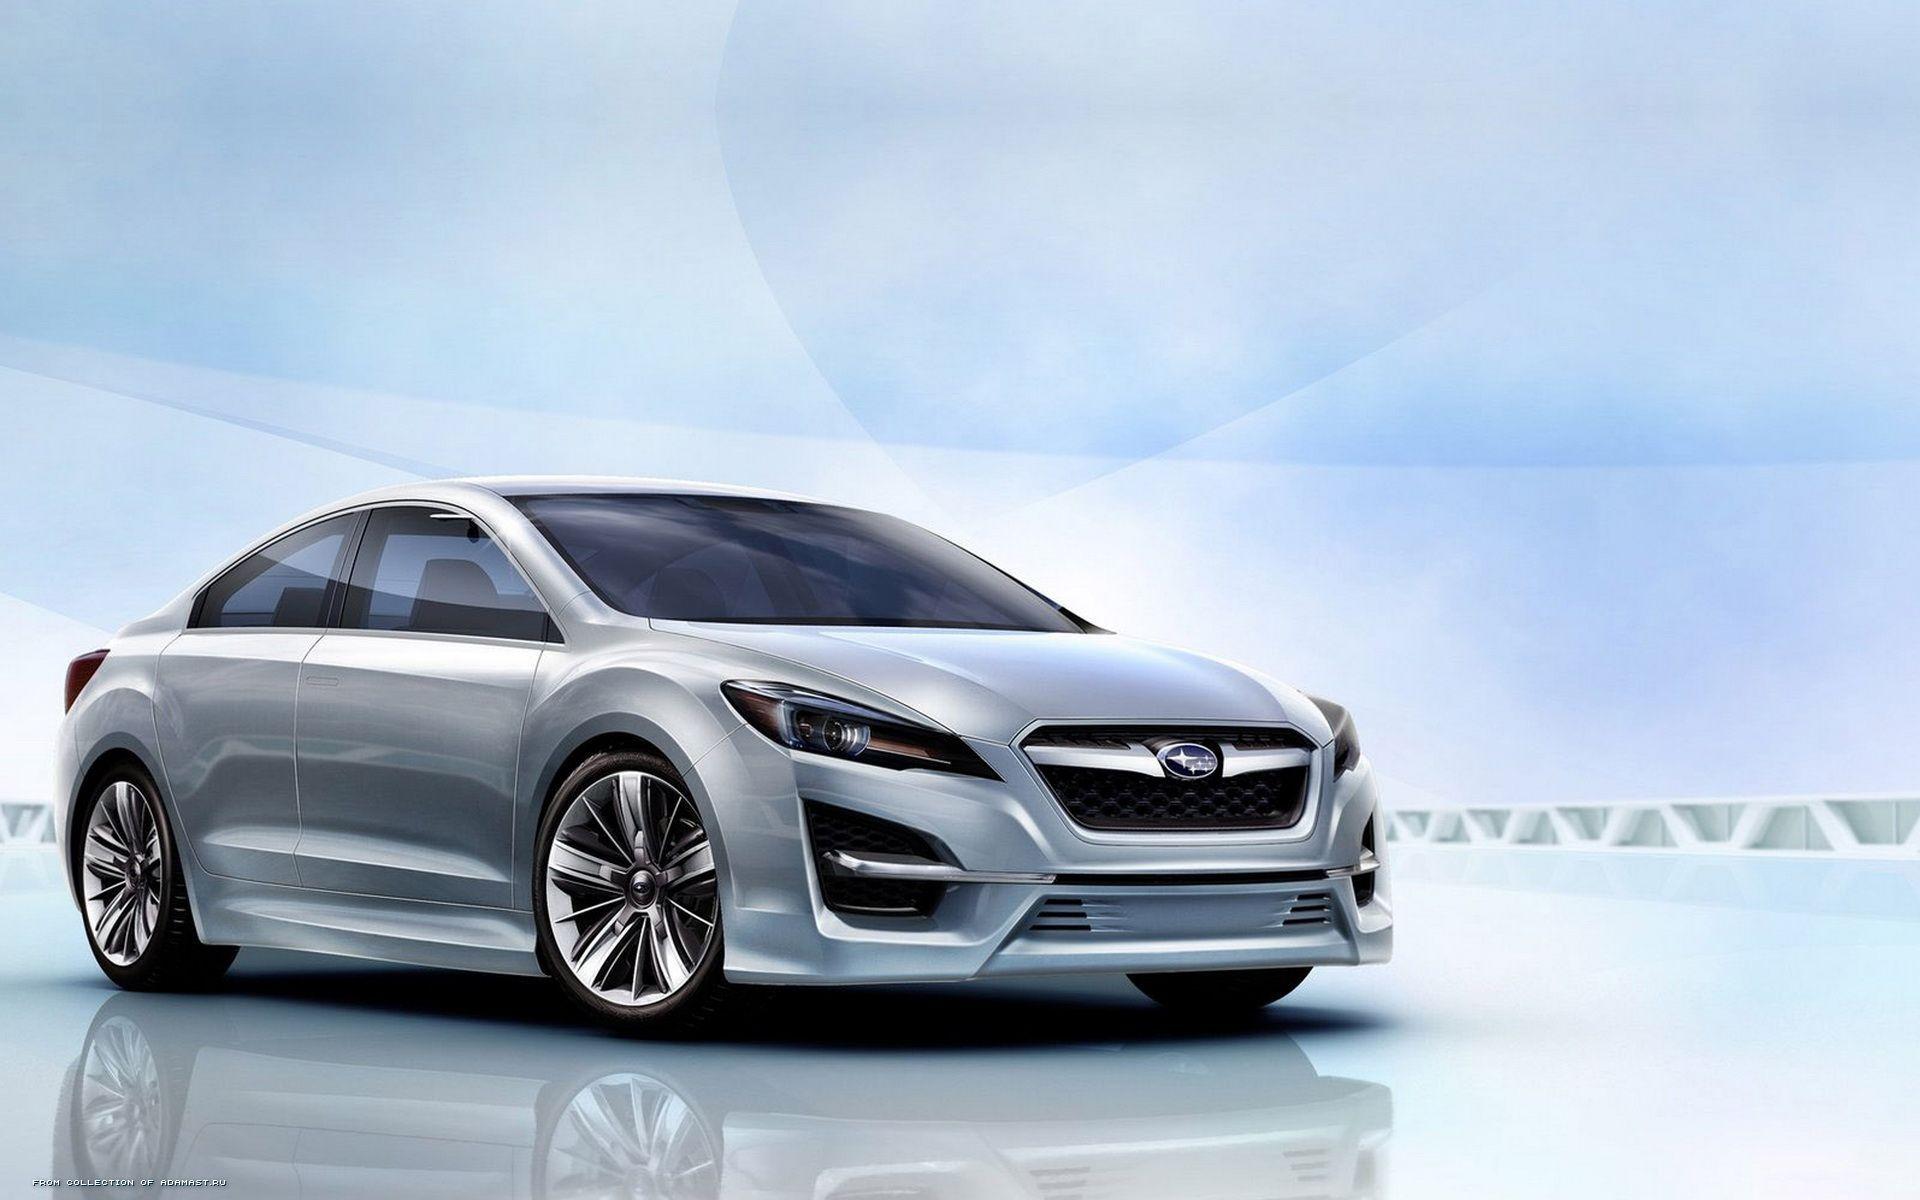 SubaruImpreza Concept (With images) Subaru impreza